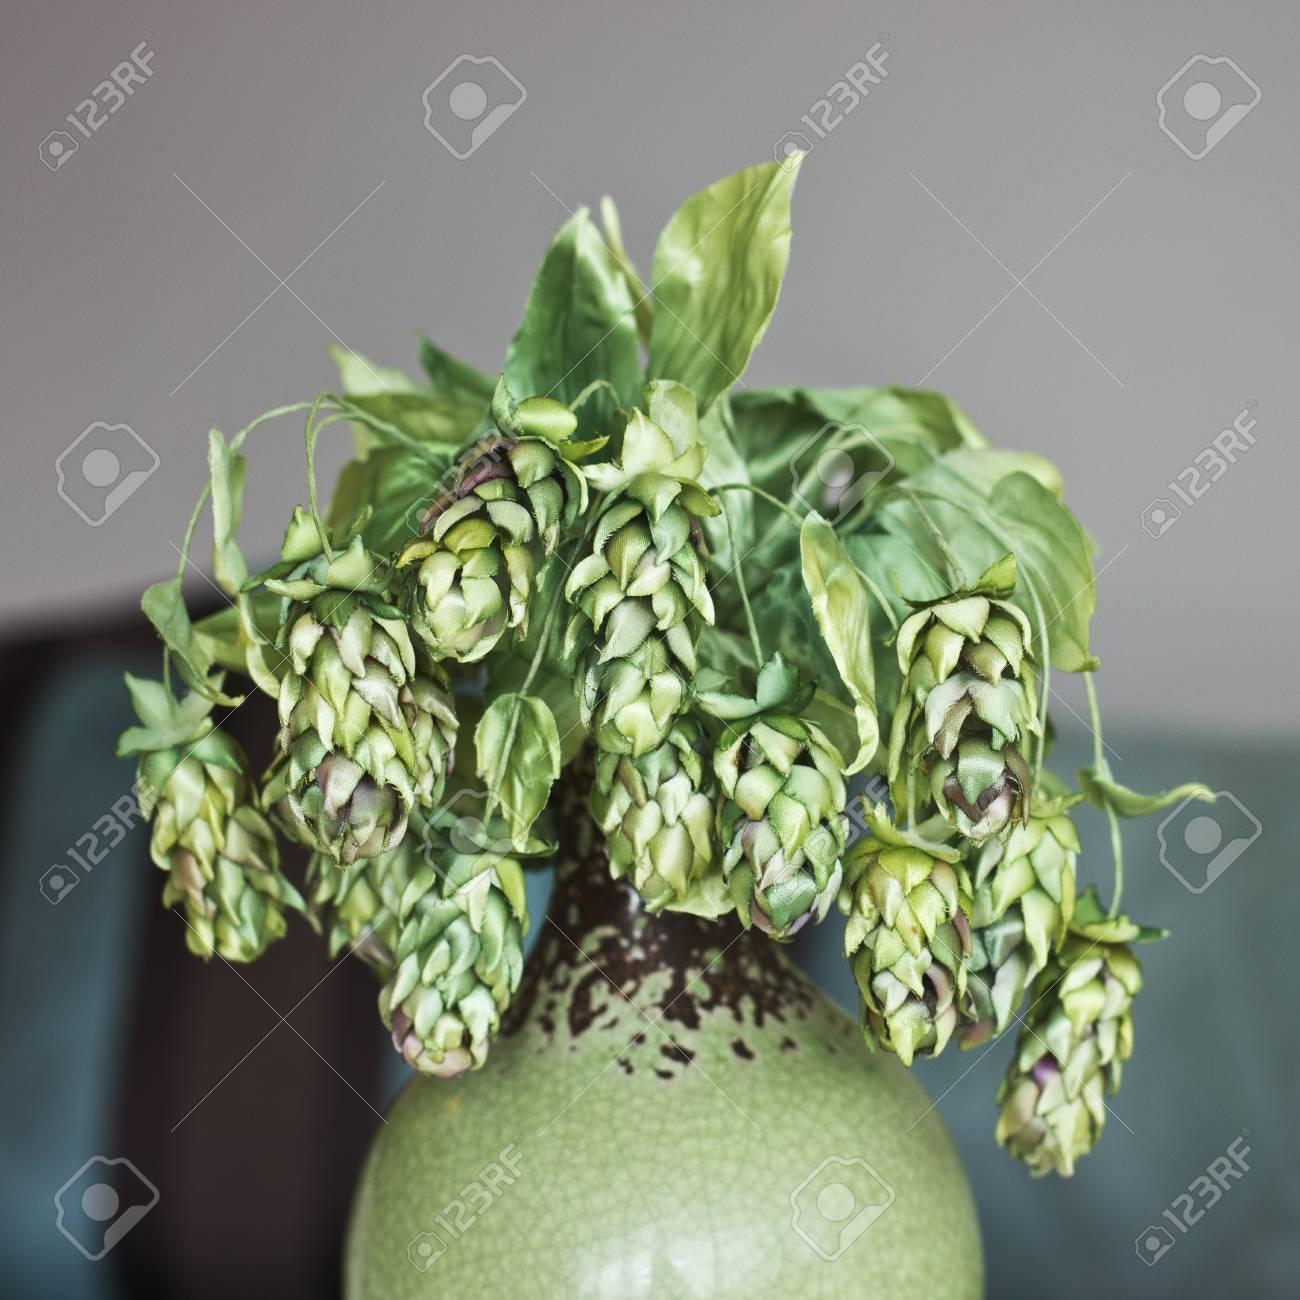 Cones of green hops artificial silk flowers in interior stock photo cones of green hops artificial silk flowers in interior stock photo 96679600 mightylinksfo